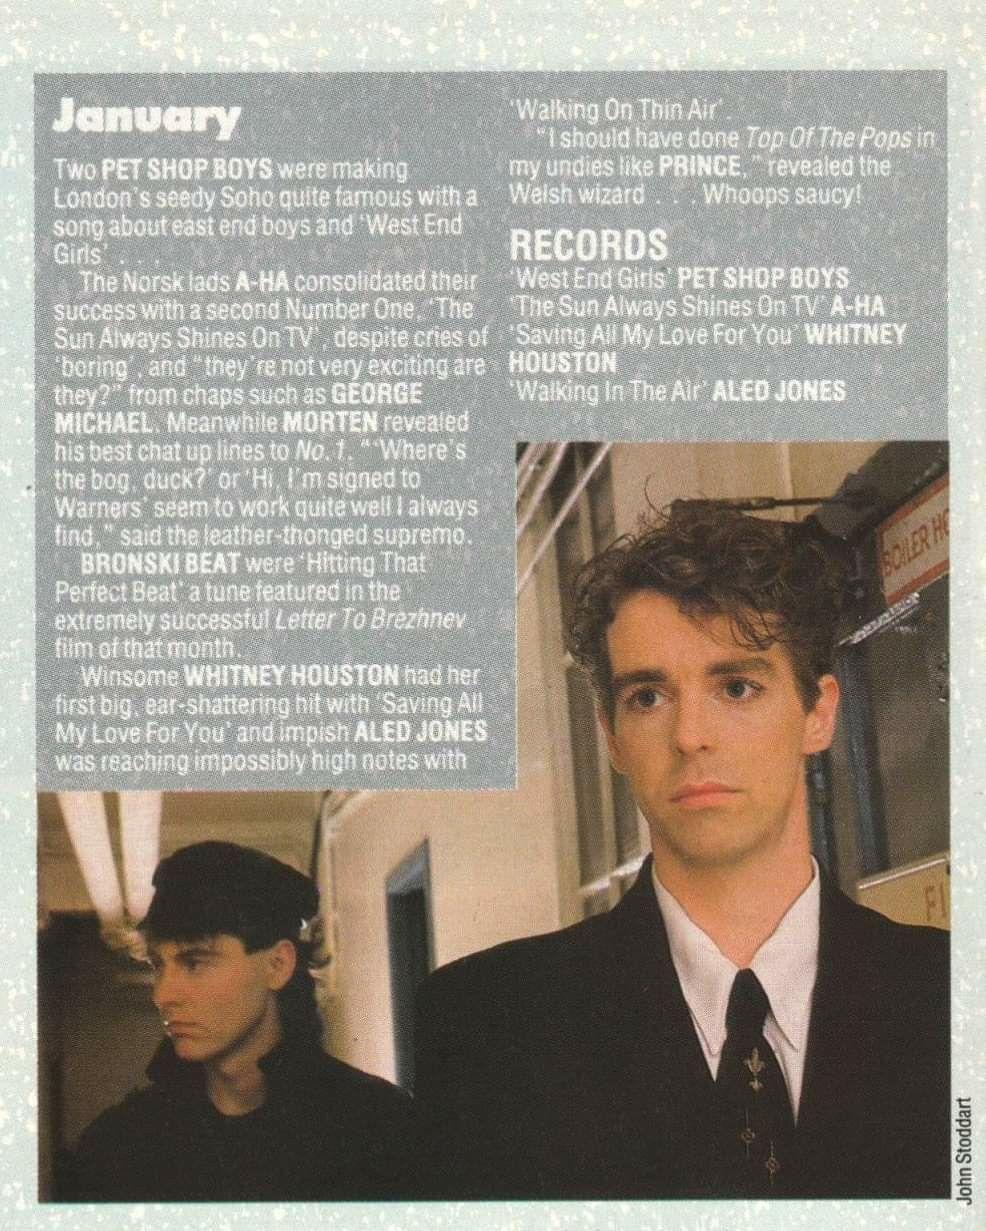 Pet Shop Boys Discography Google Search Lionel Richie My